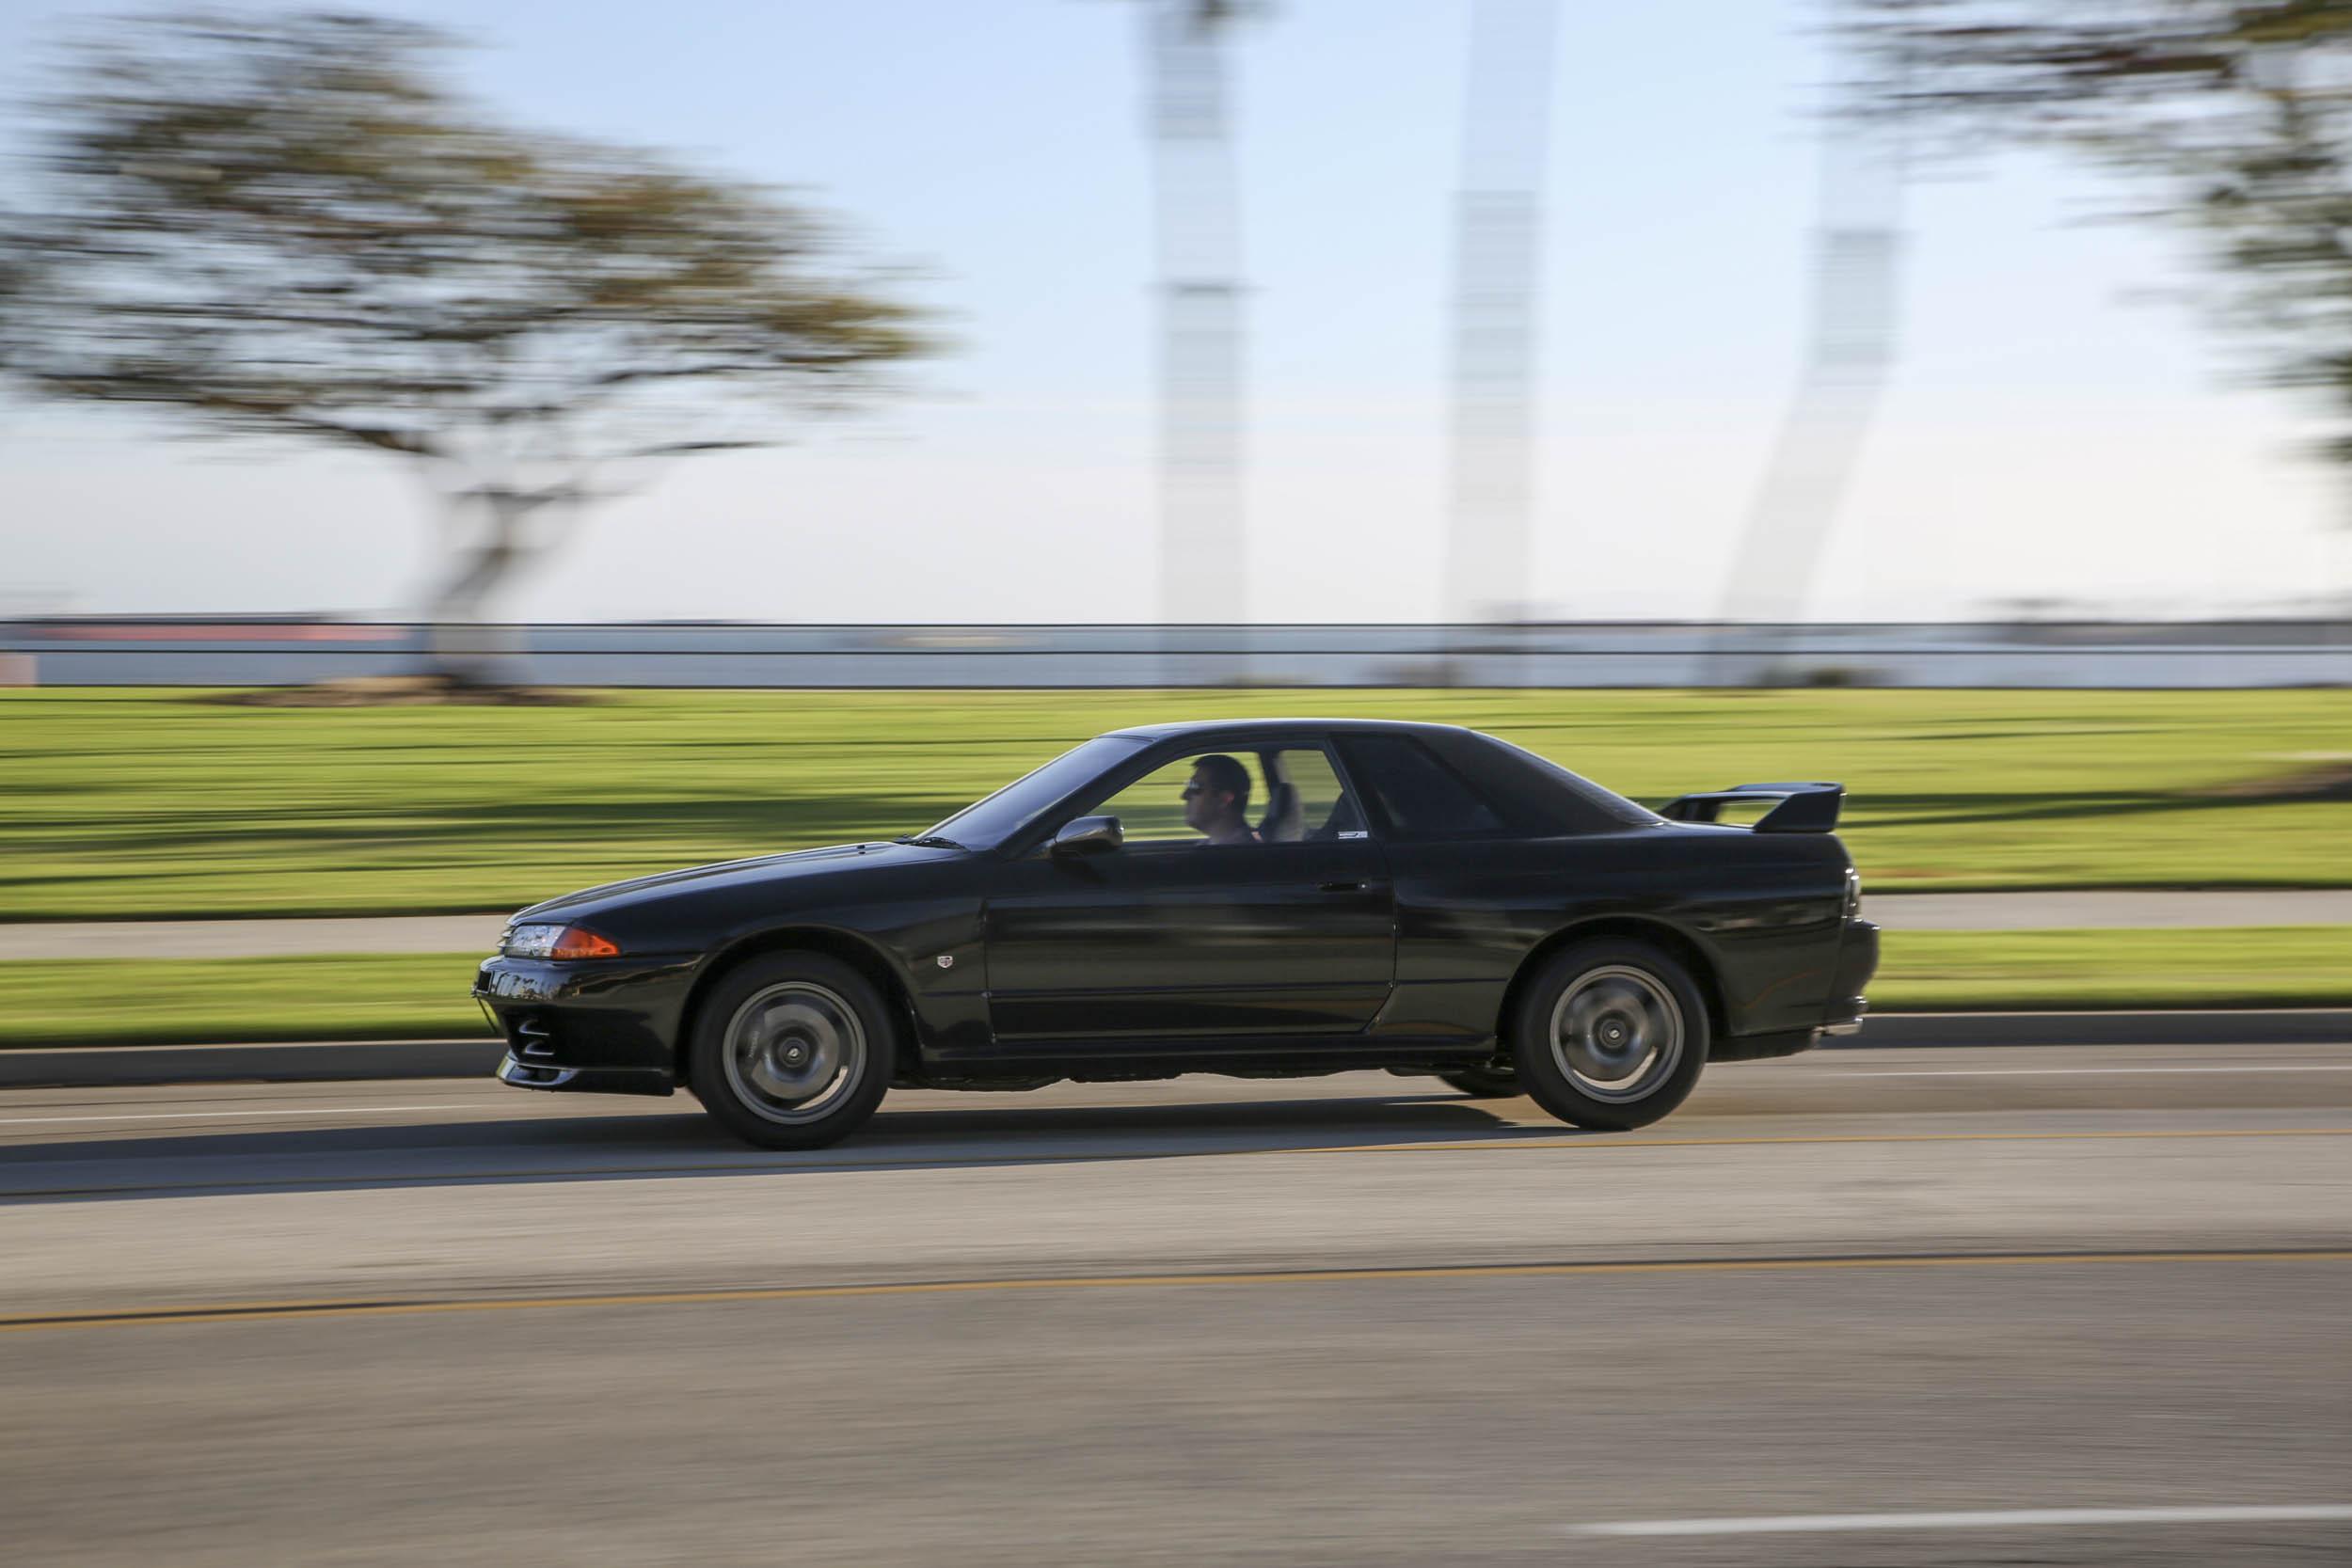 Nissan R32 GT-R driving